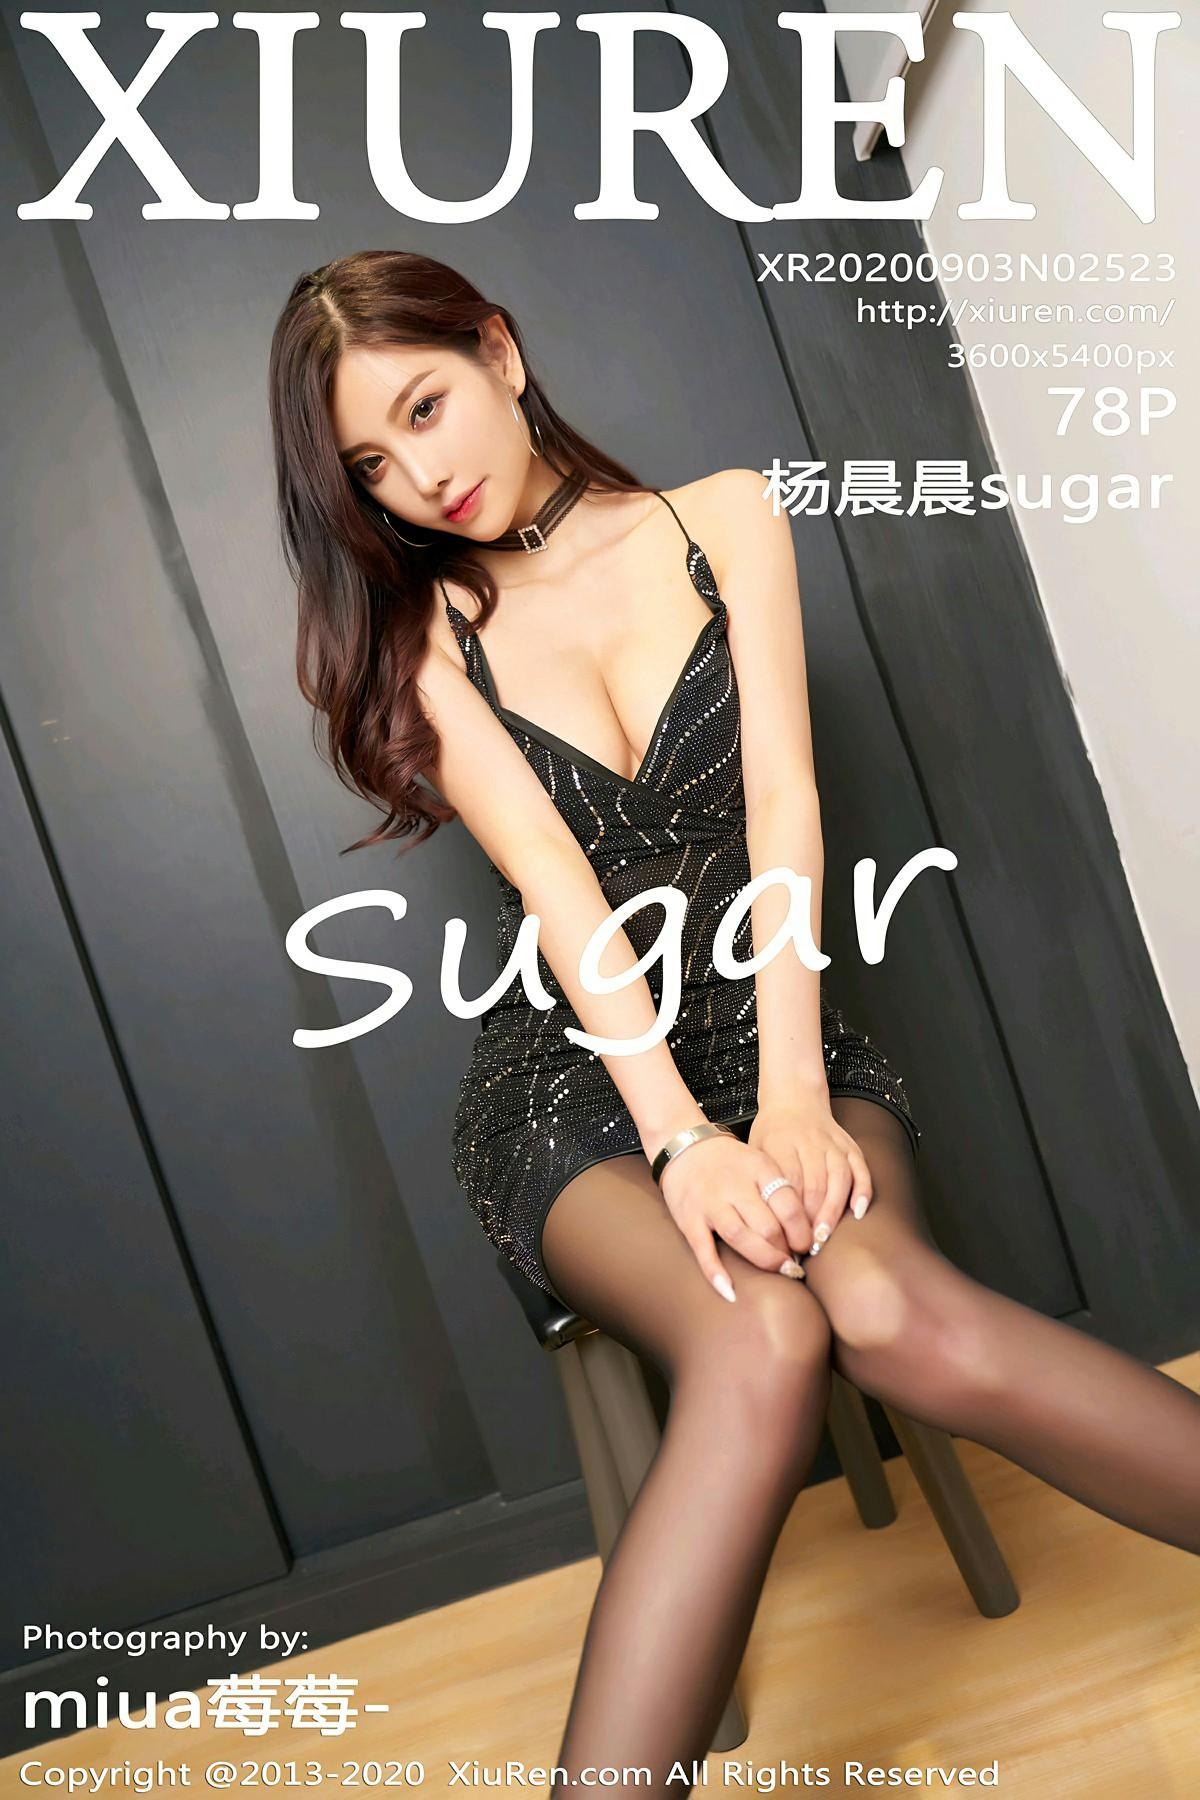 [XiuRen秀人网] 2020.09.03 No.2523 杨晨晨sugar 极致黑丝 第1张